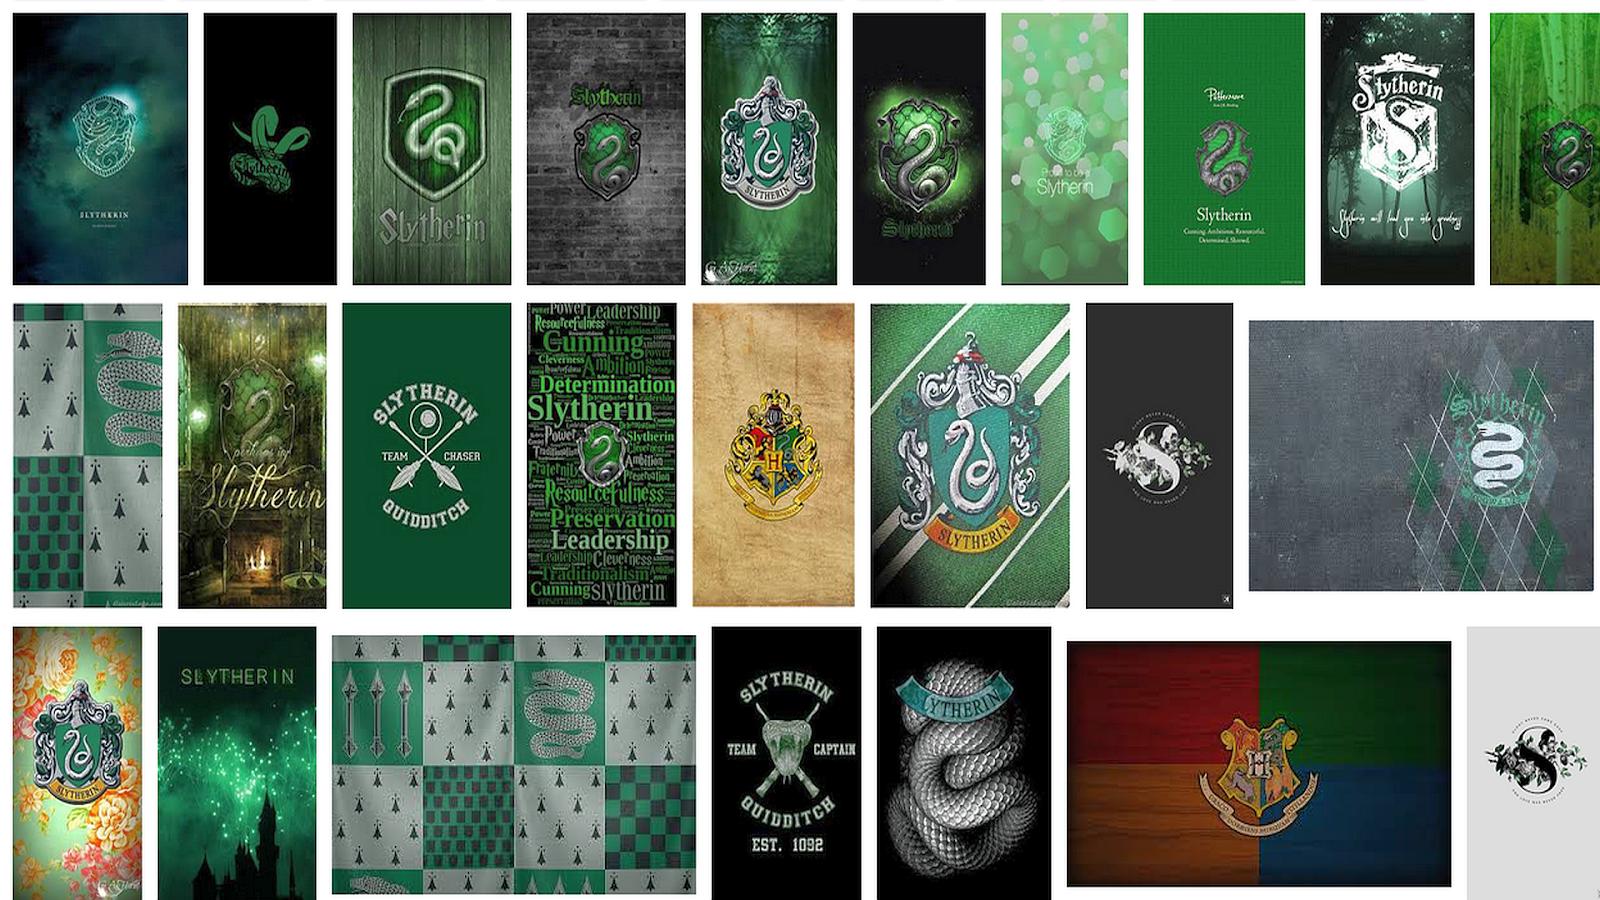 Slytherin Wallpaper Slytherin Wallpaper Iphone Ravenclaw - Slytherin Wallpaper Iphone - HD Wallpaper